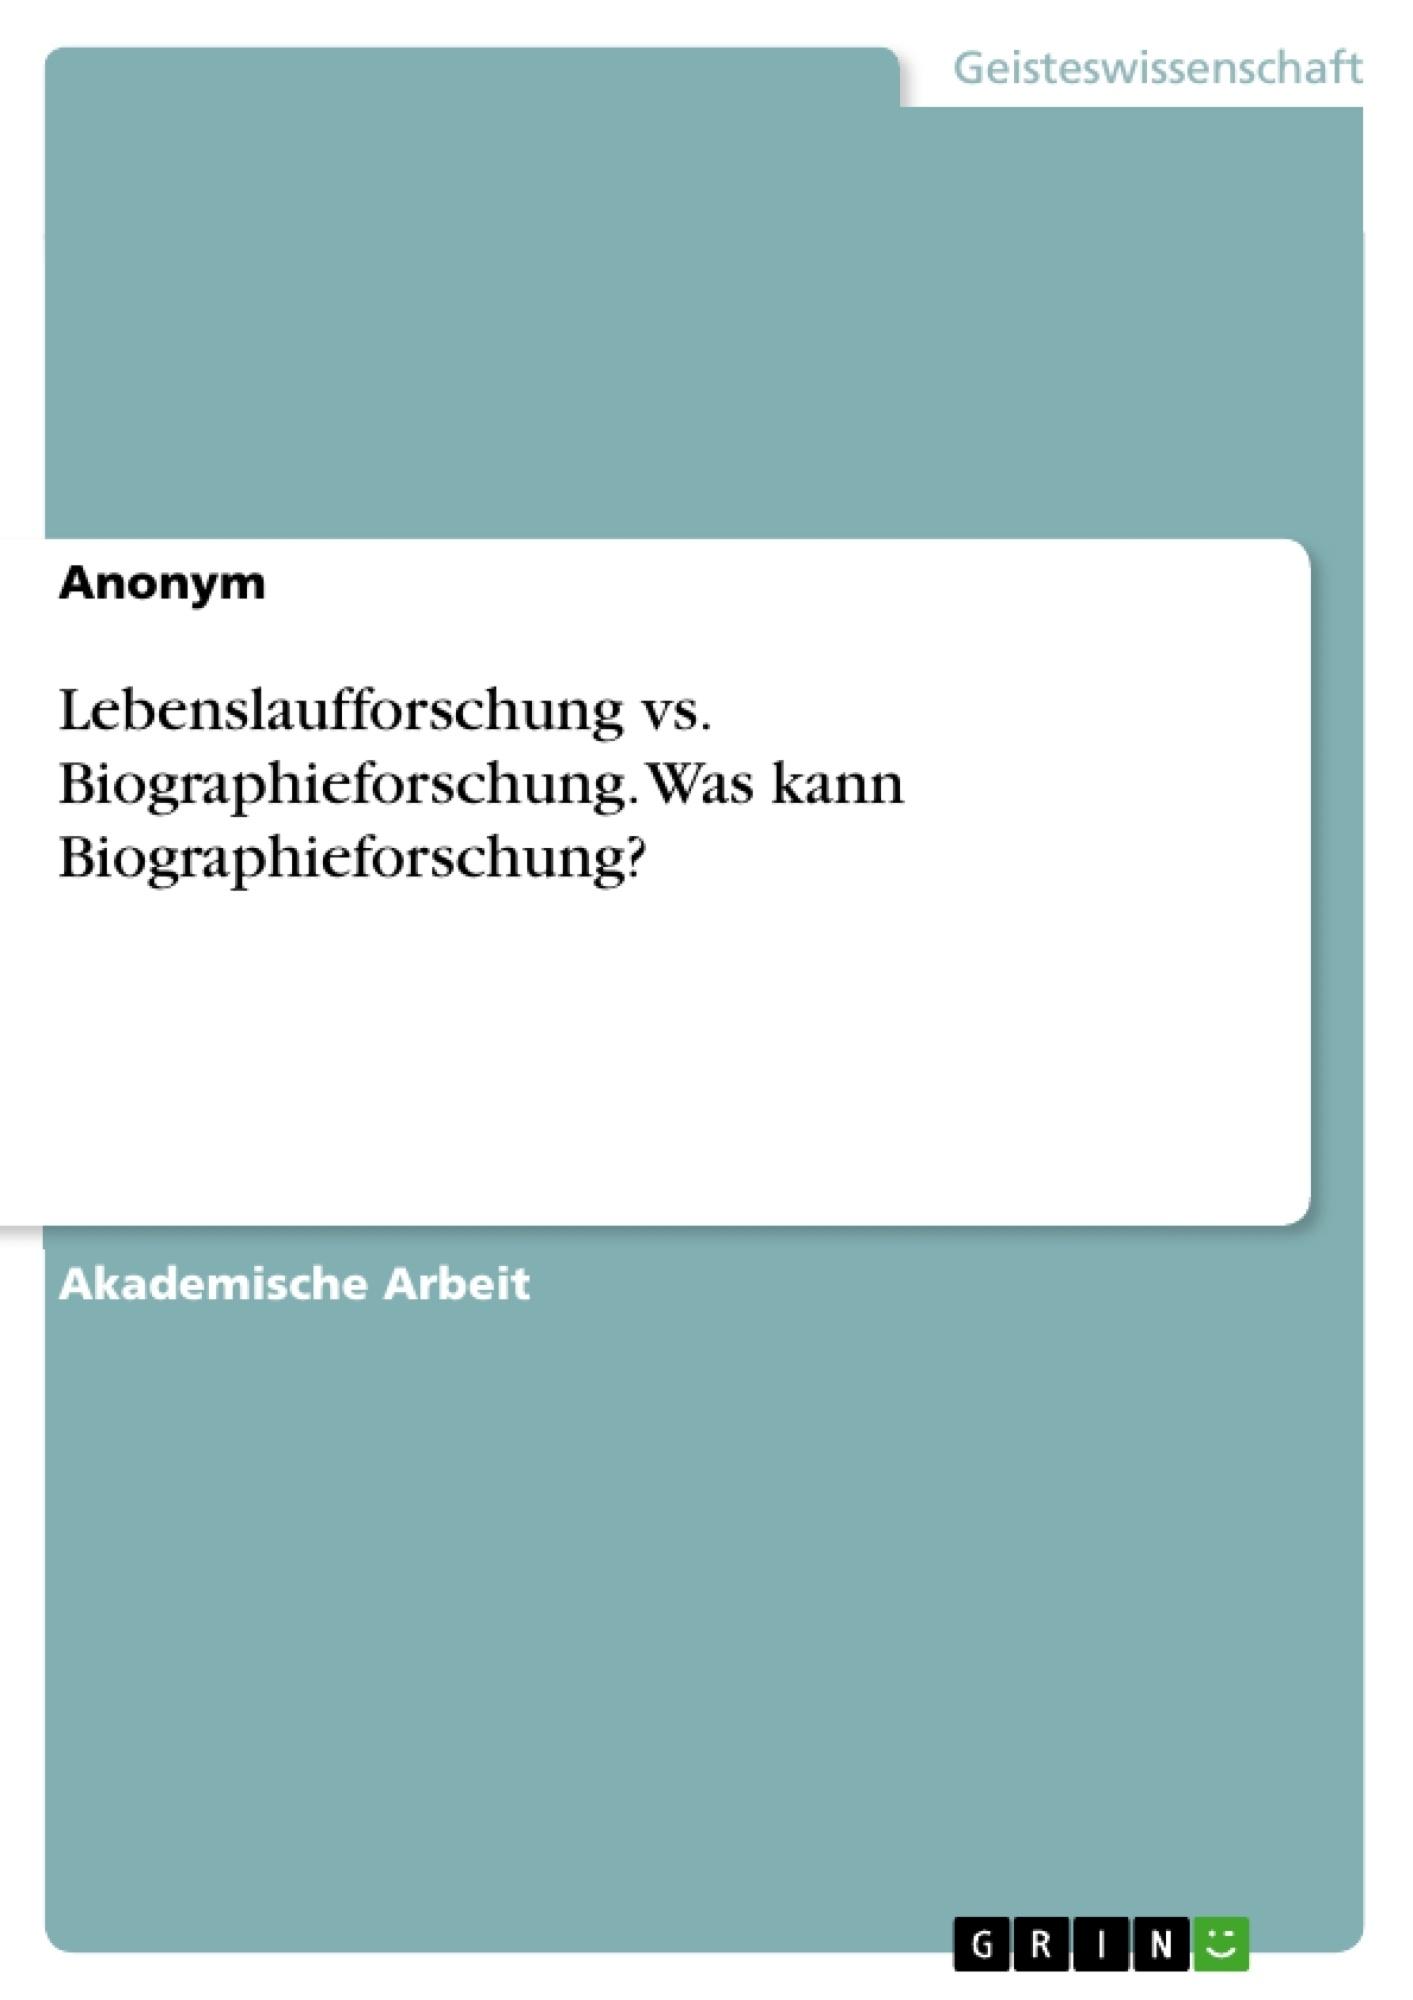 Titel: Lebenslaufforschung vs. Biographieforschung. Was kann Biographieforschung?